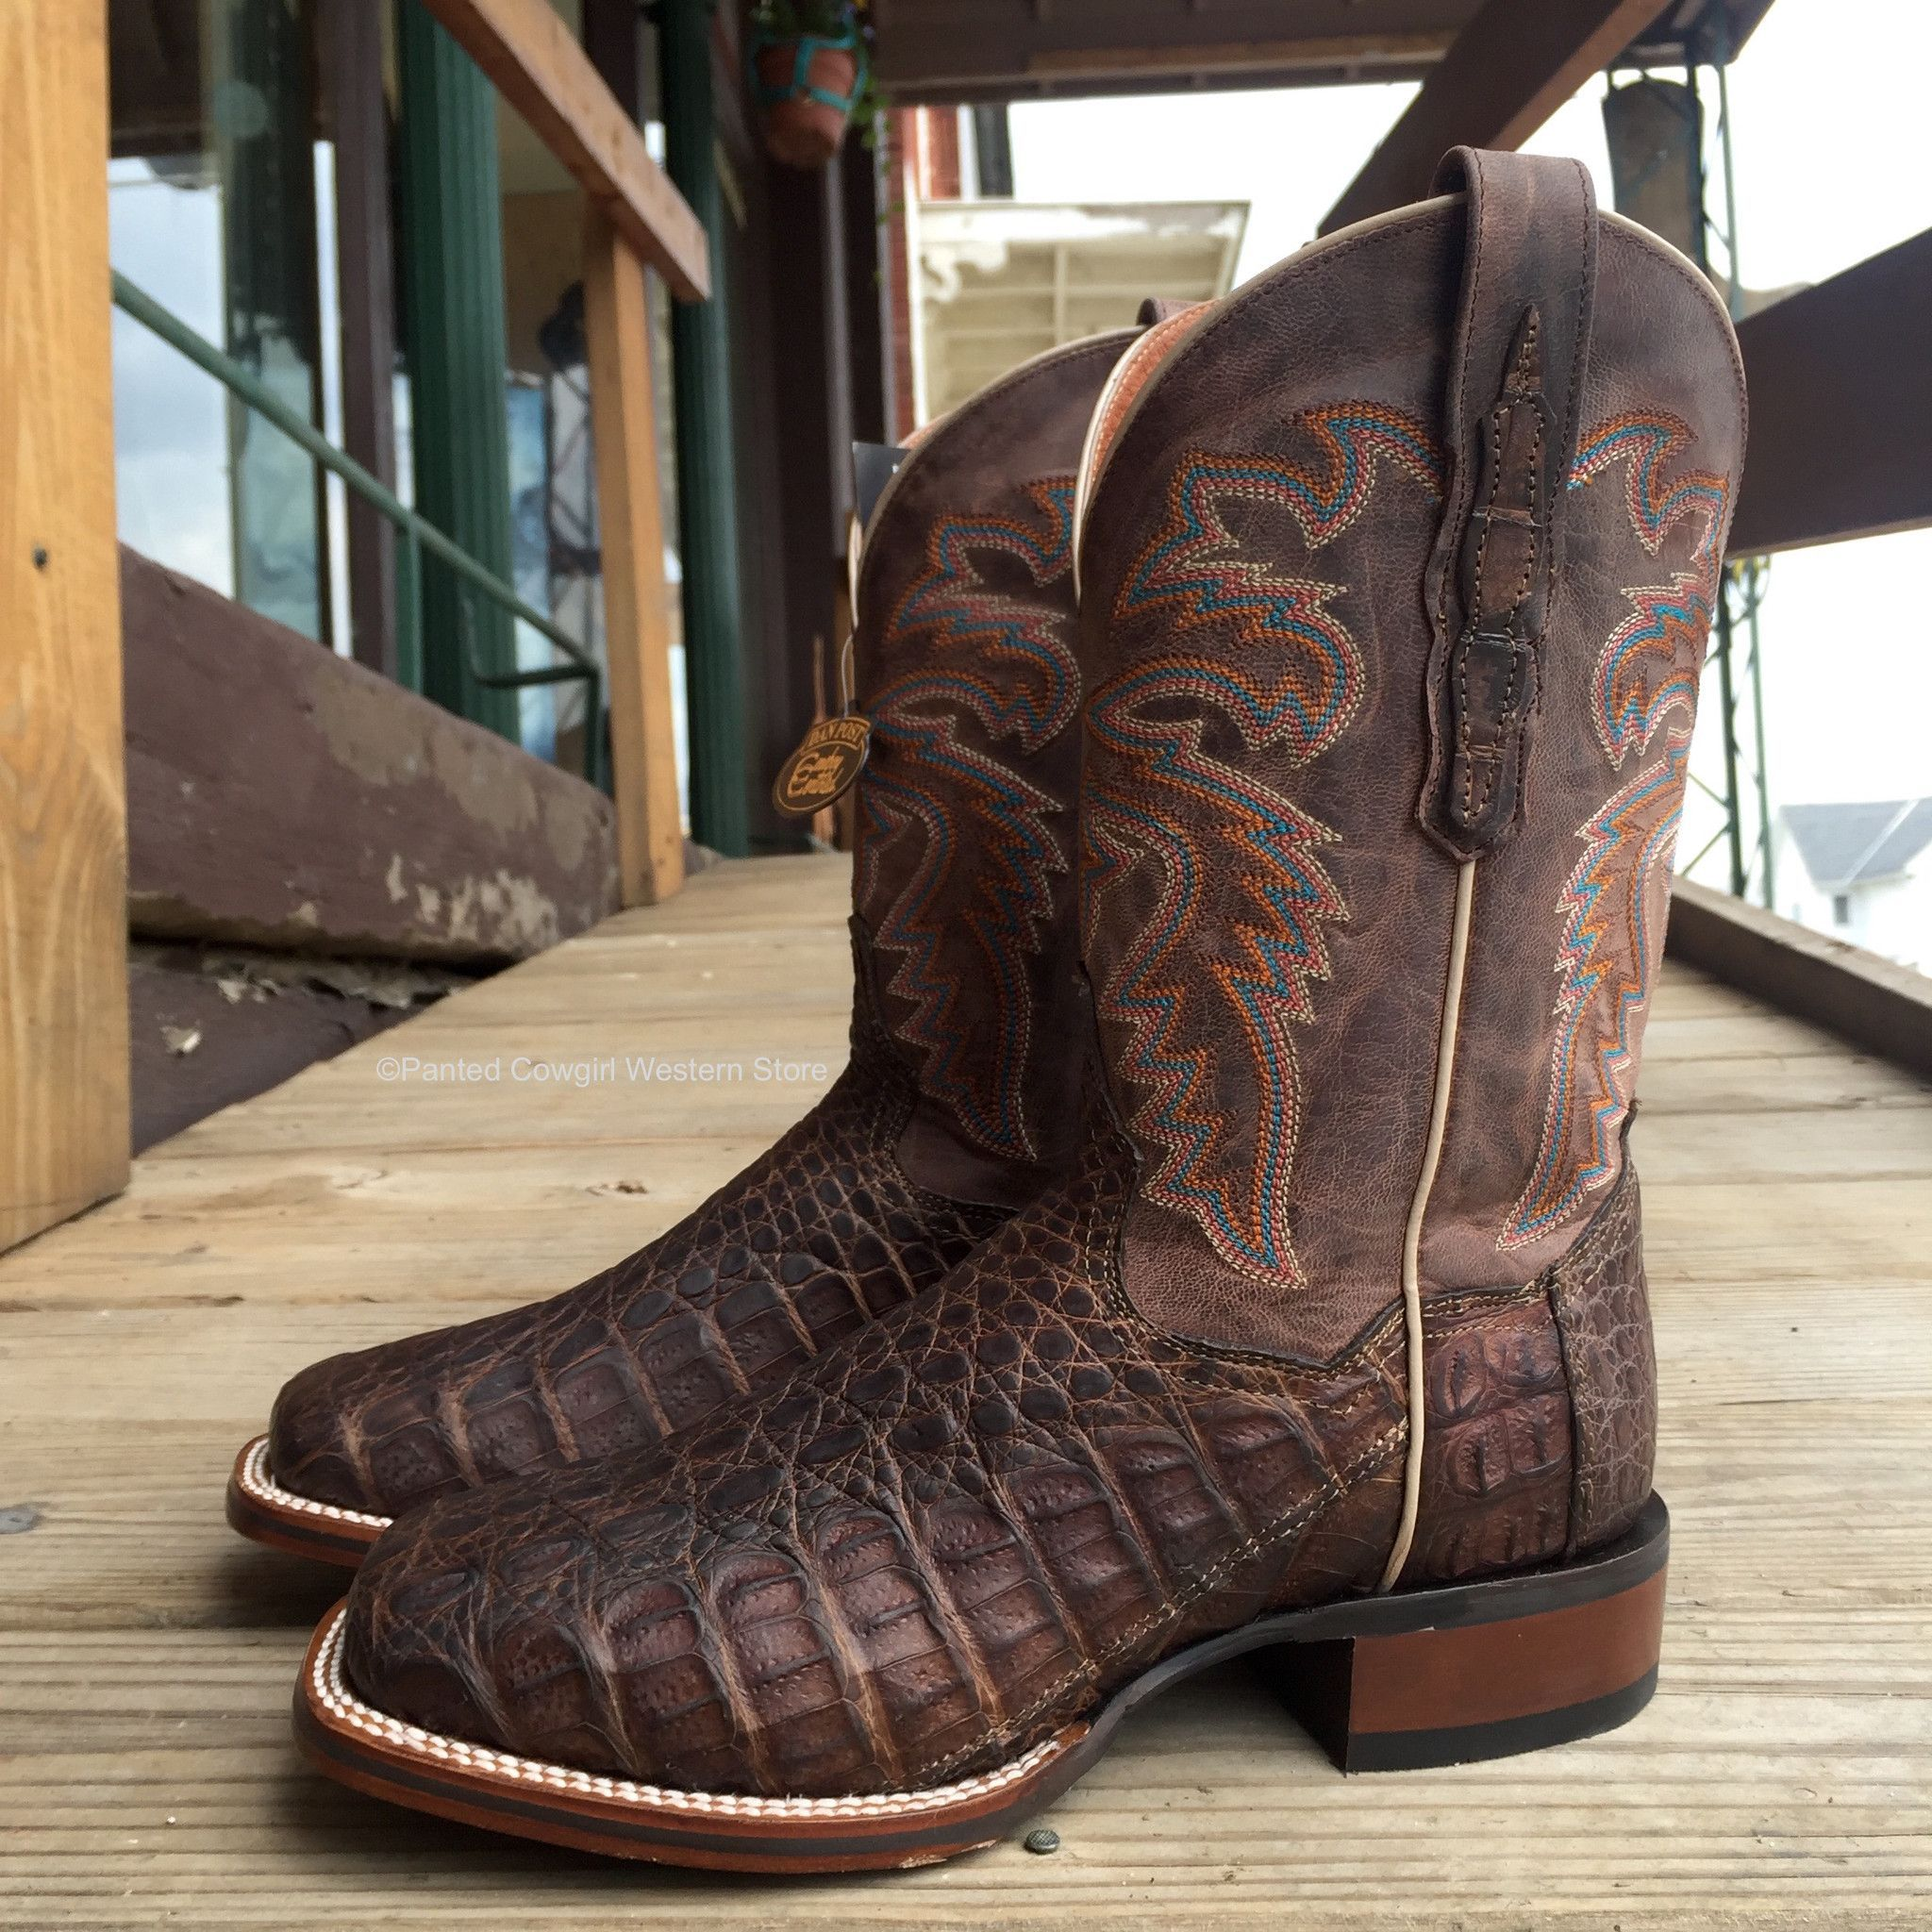 8f07590cecc Dan Post Men's Denver Caiman Handmade Cowboy Certified Boots DP3965 ...